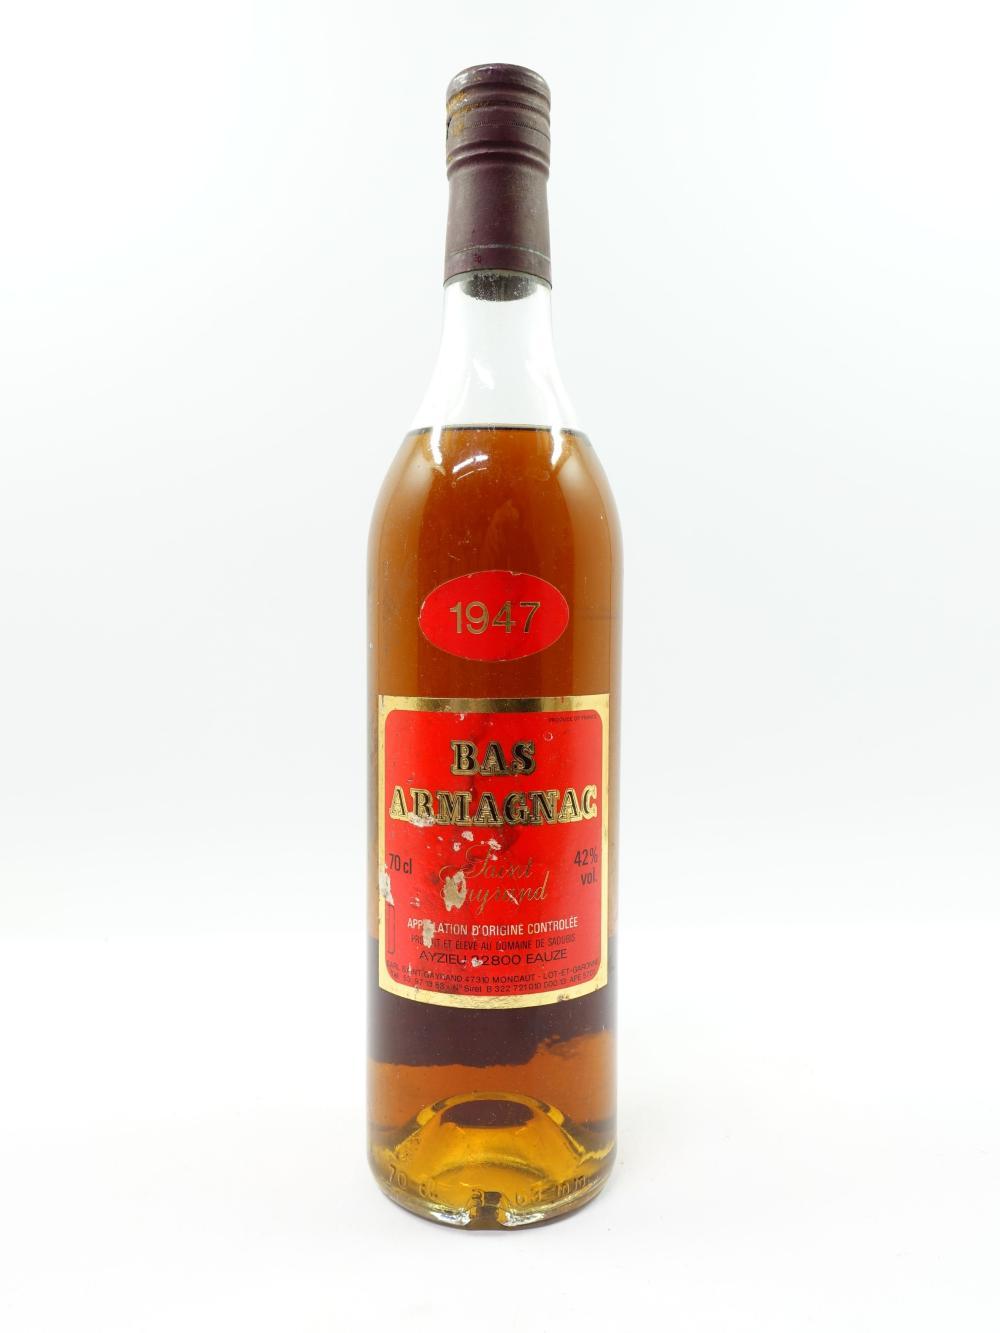 1 bouteille BAS ARMAGNAC SAINT GAYRAND 1947 (4